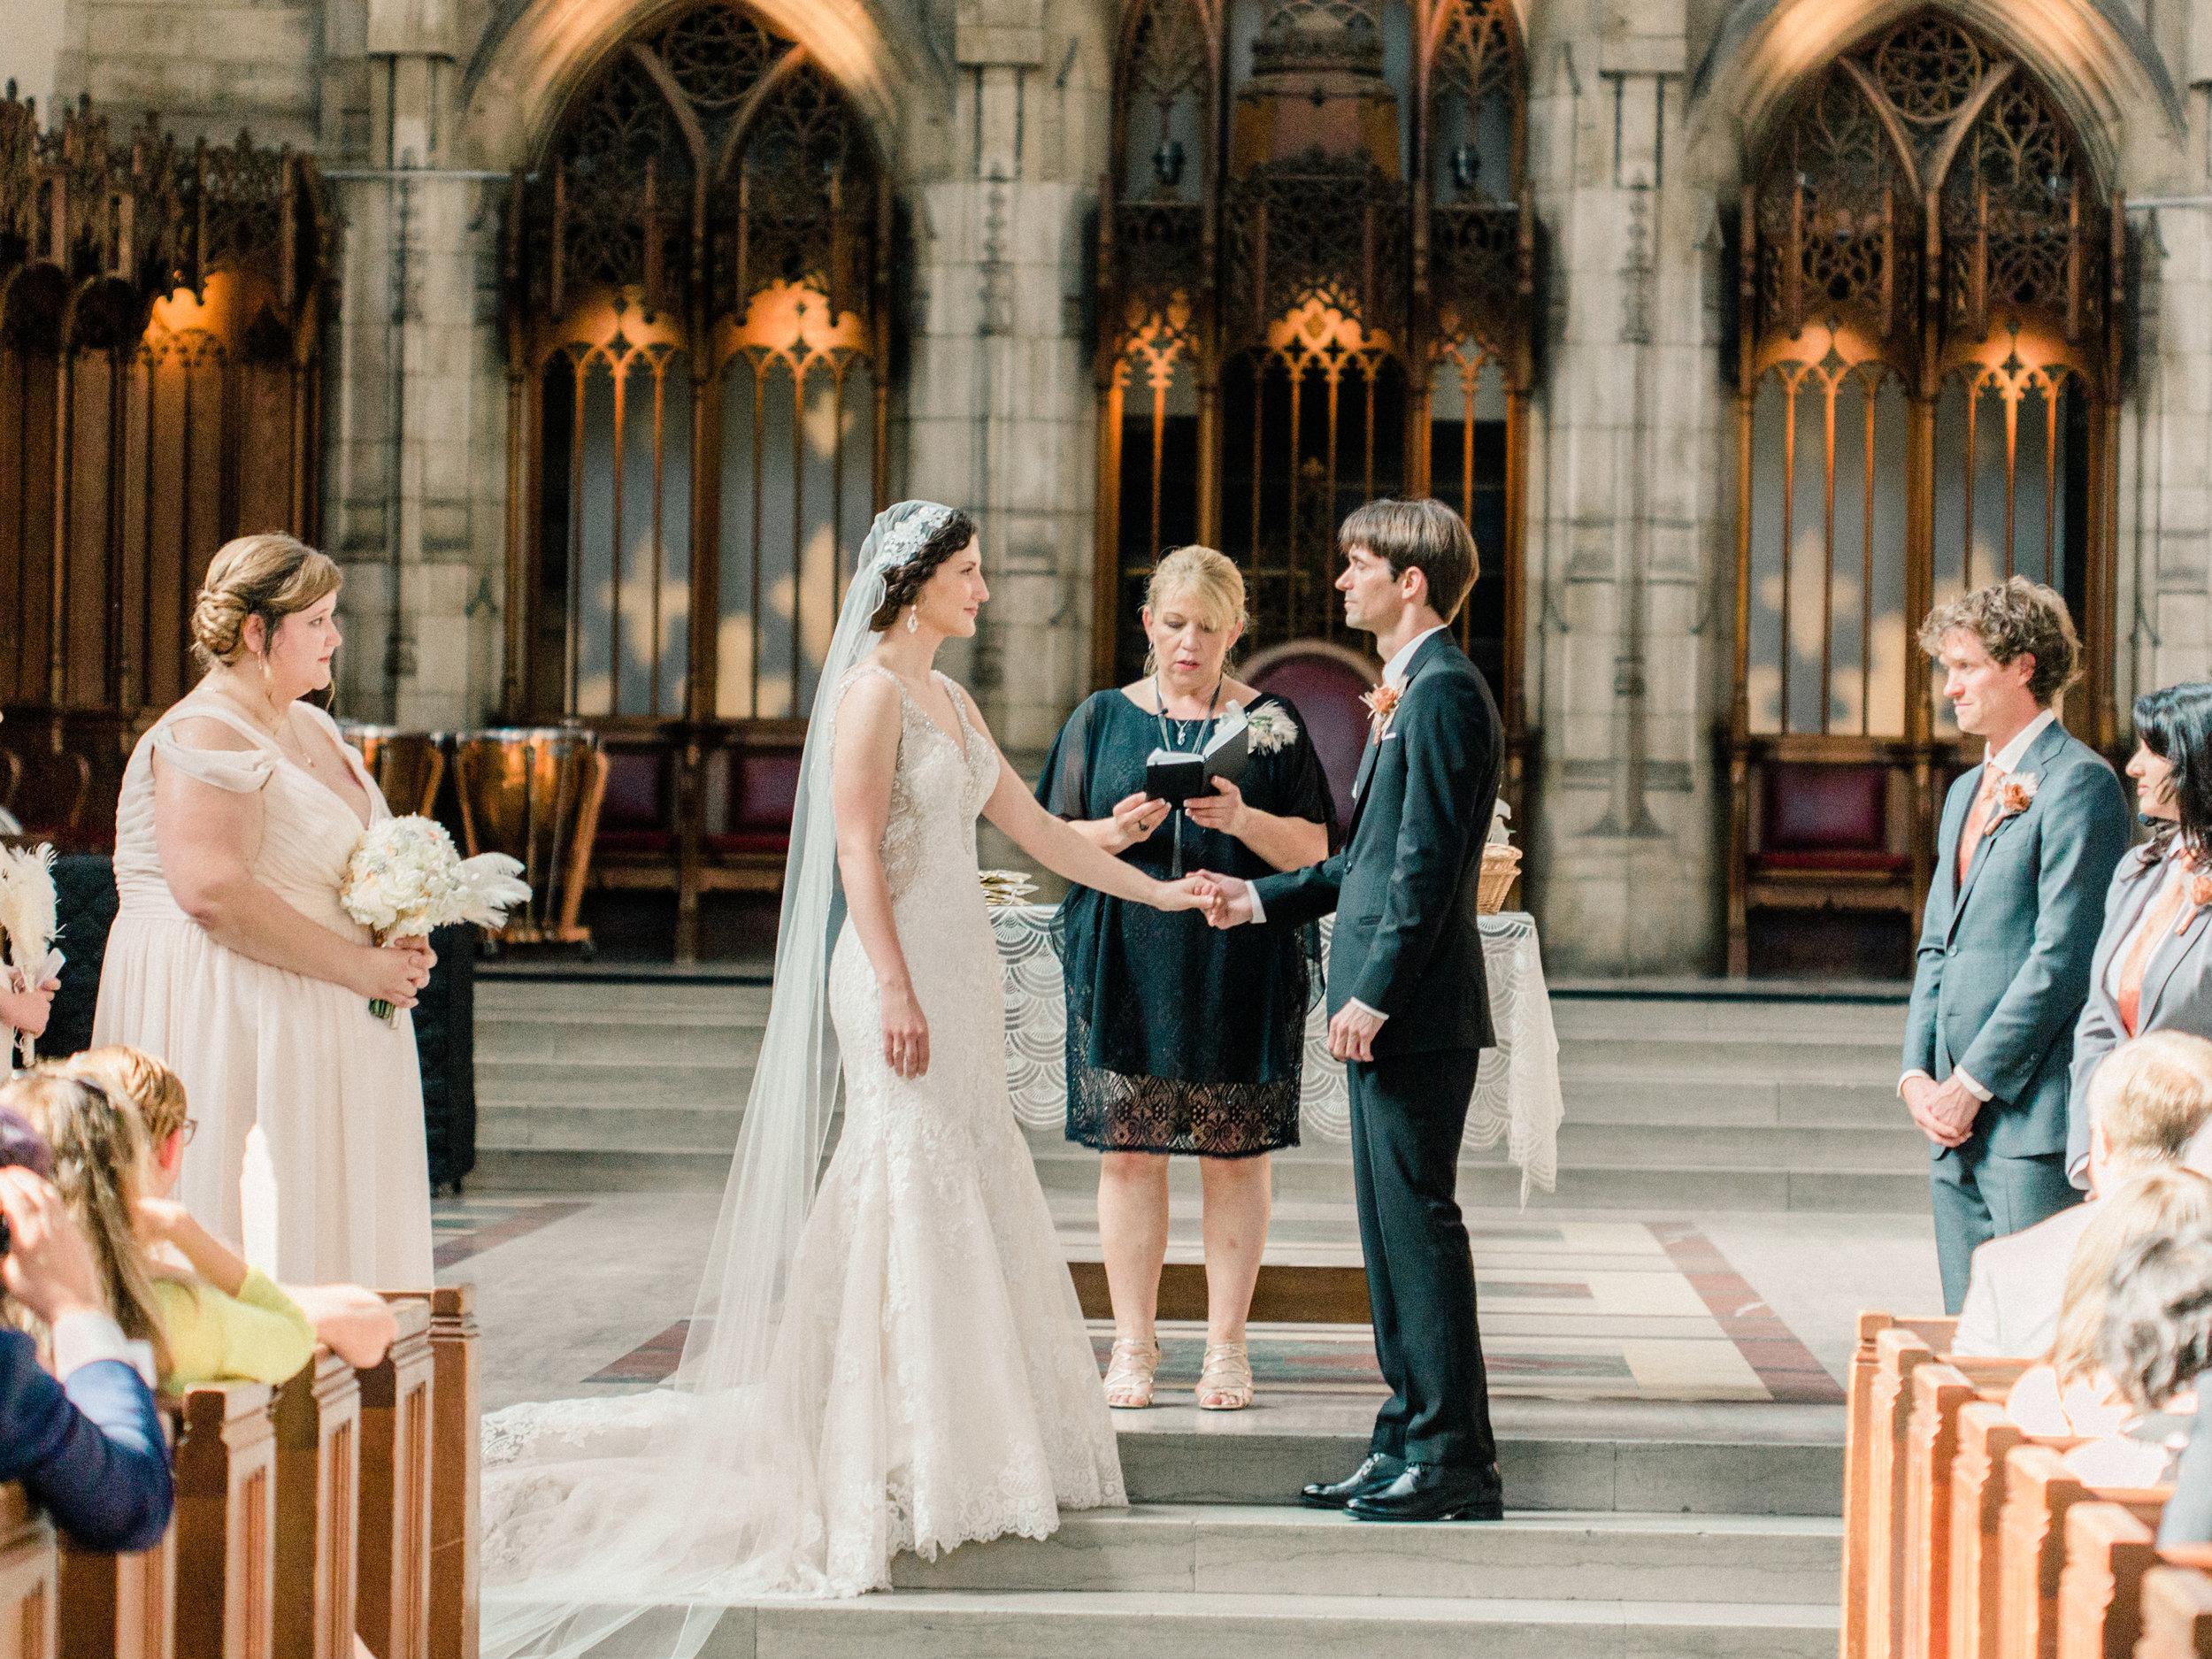 Dorothy_Louise_Photography_University_of_Chicago_Chapel_Wedding-25.jpg